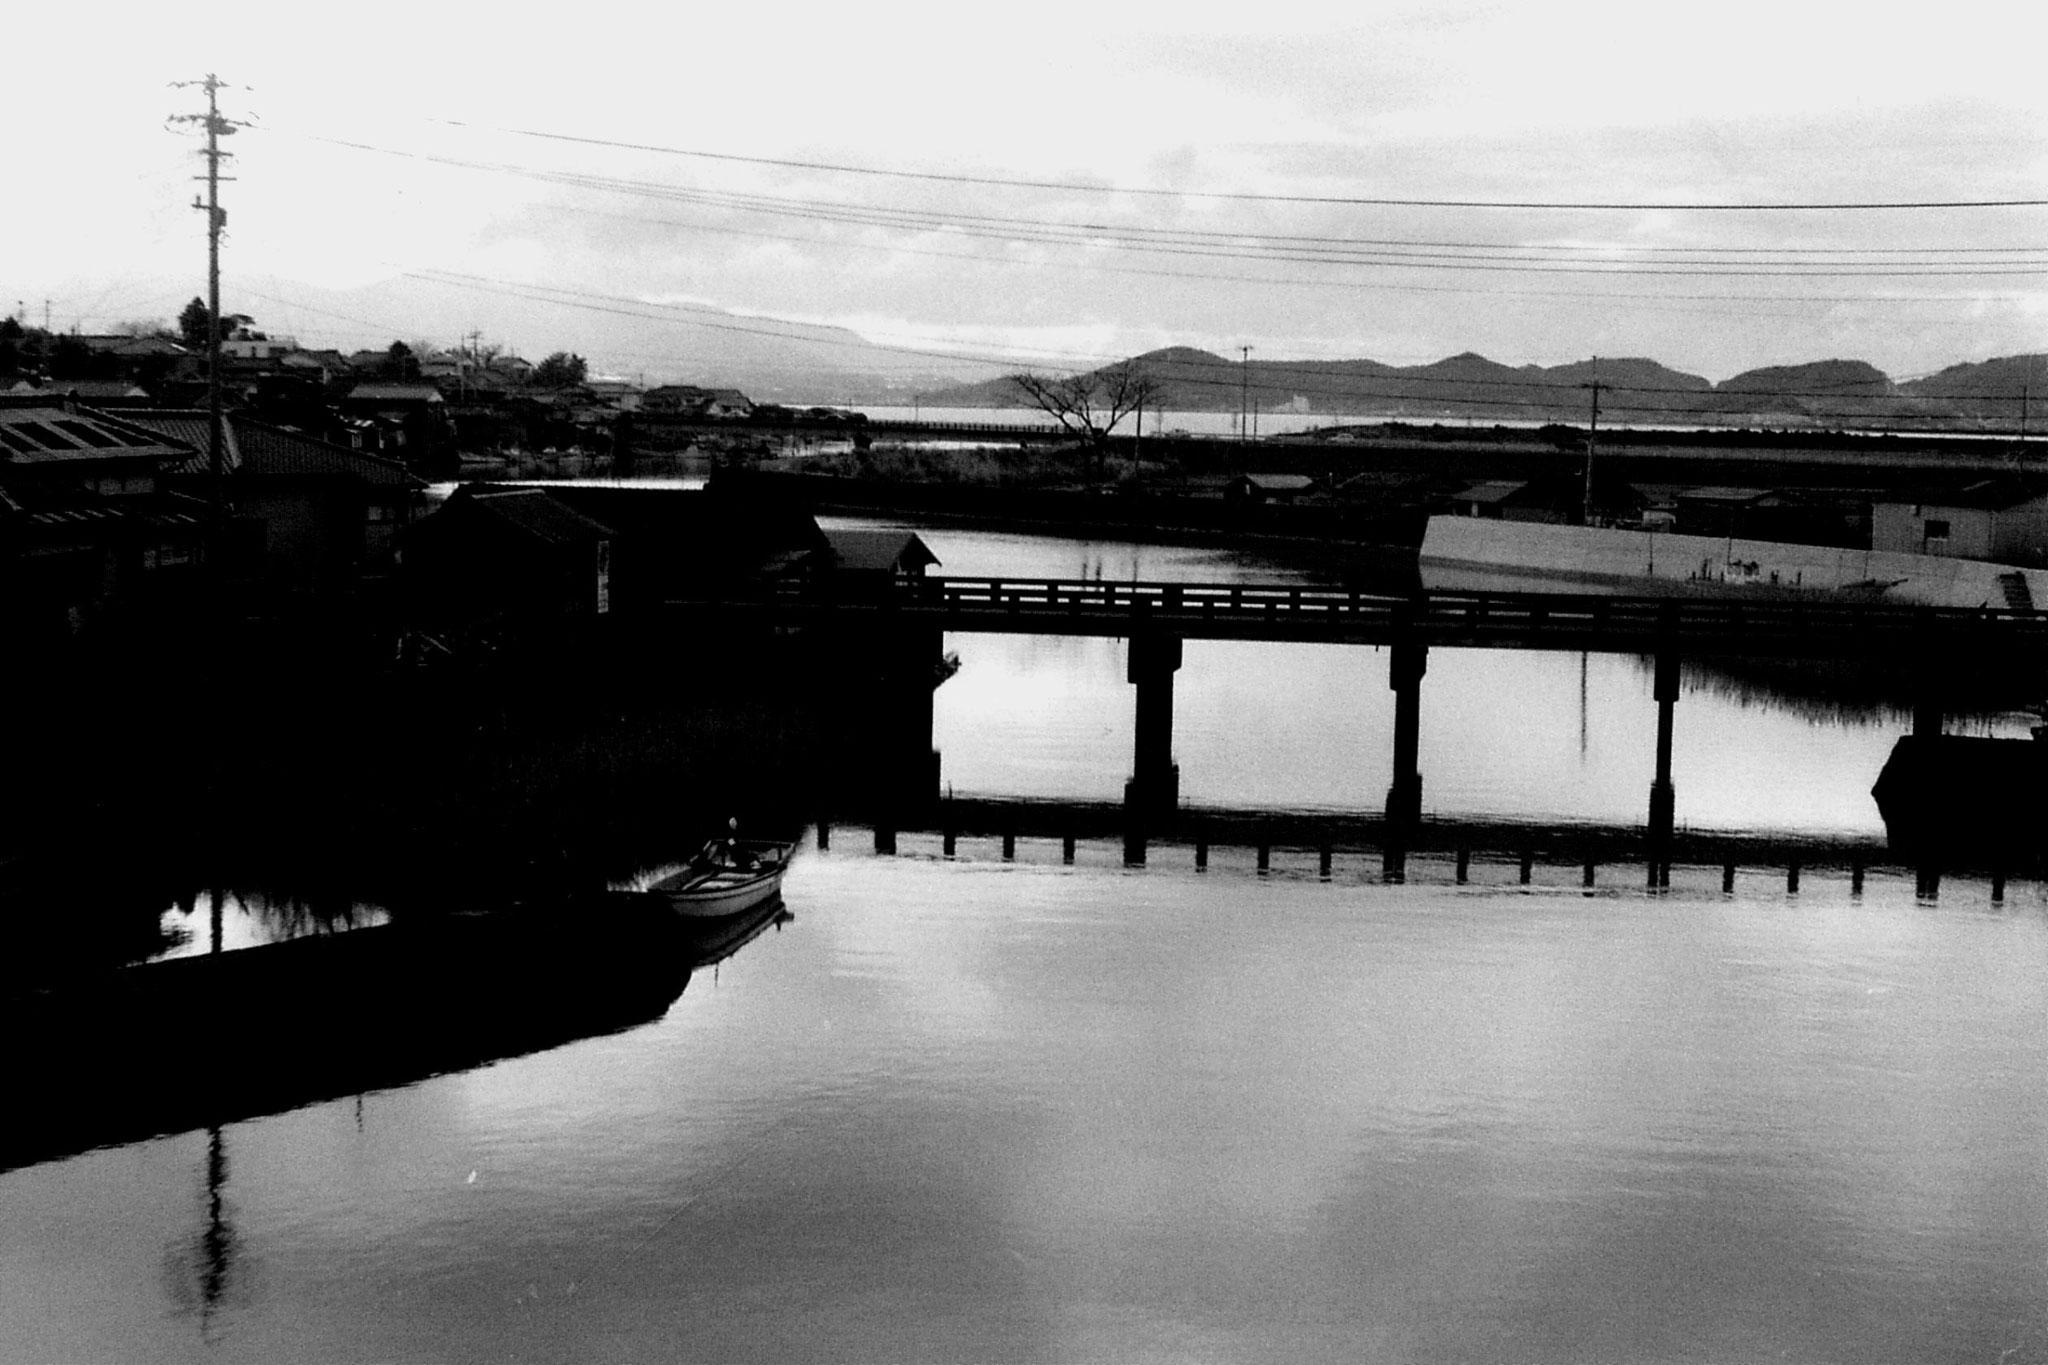 21/1/1989: 1: en route Nagasaki to Kumamoto 10.40 nr Isahaya